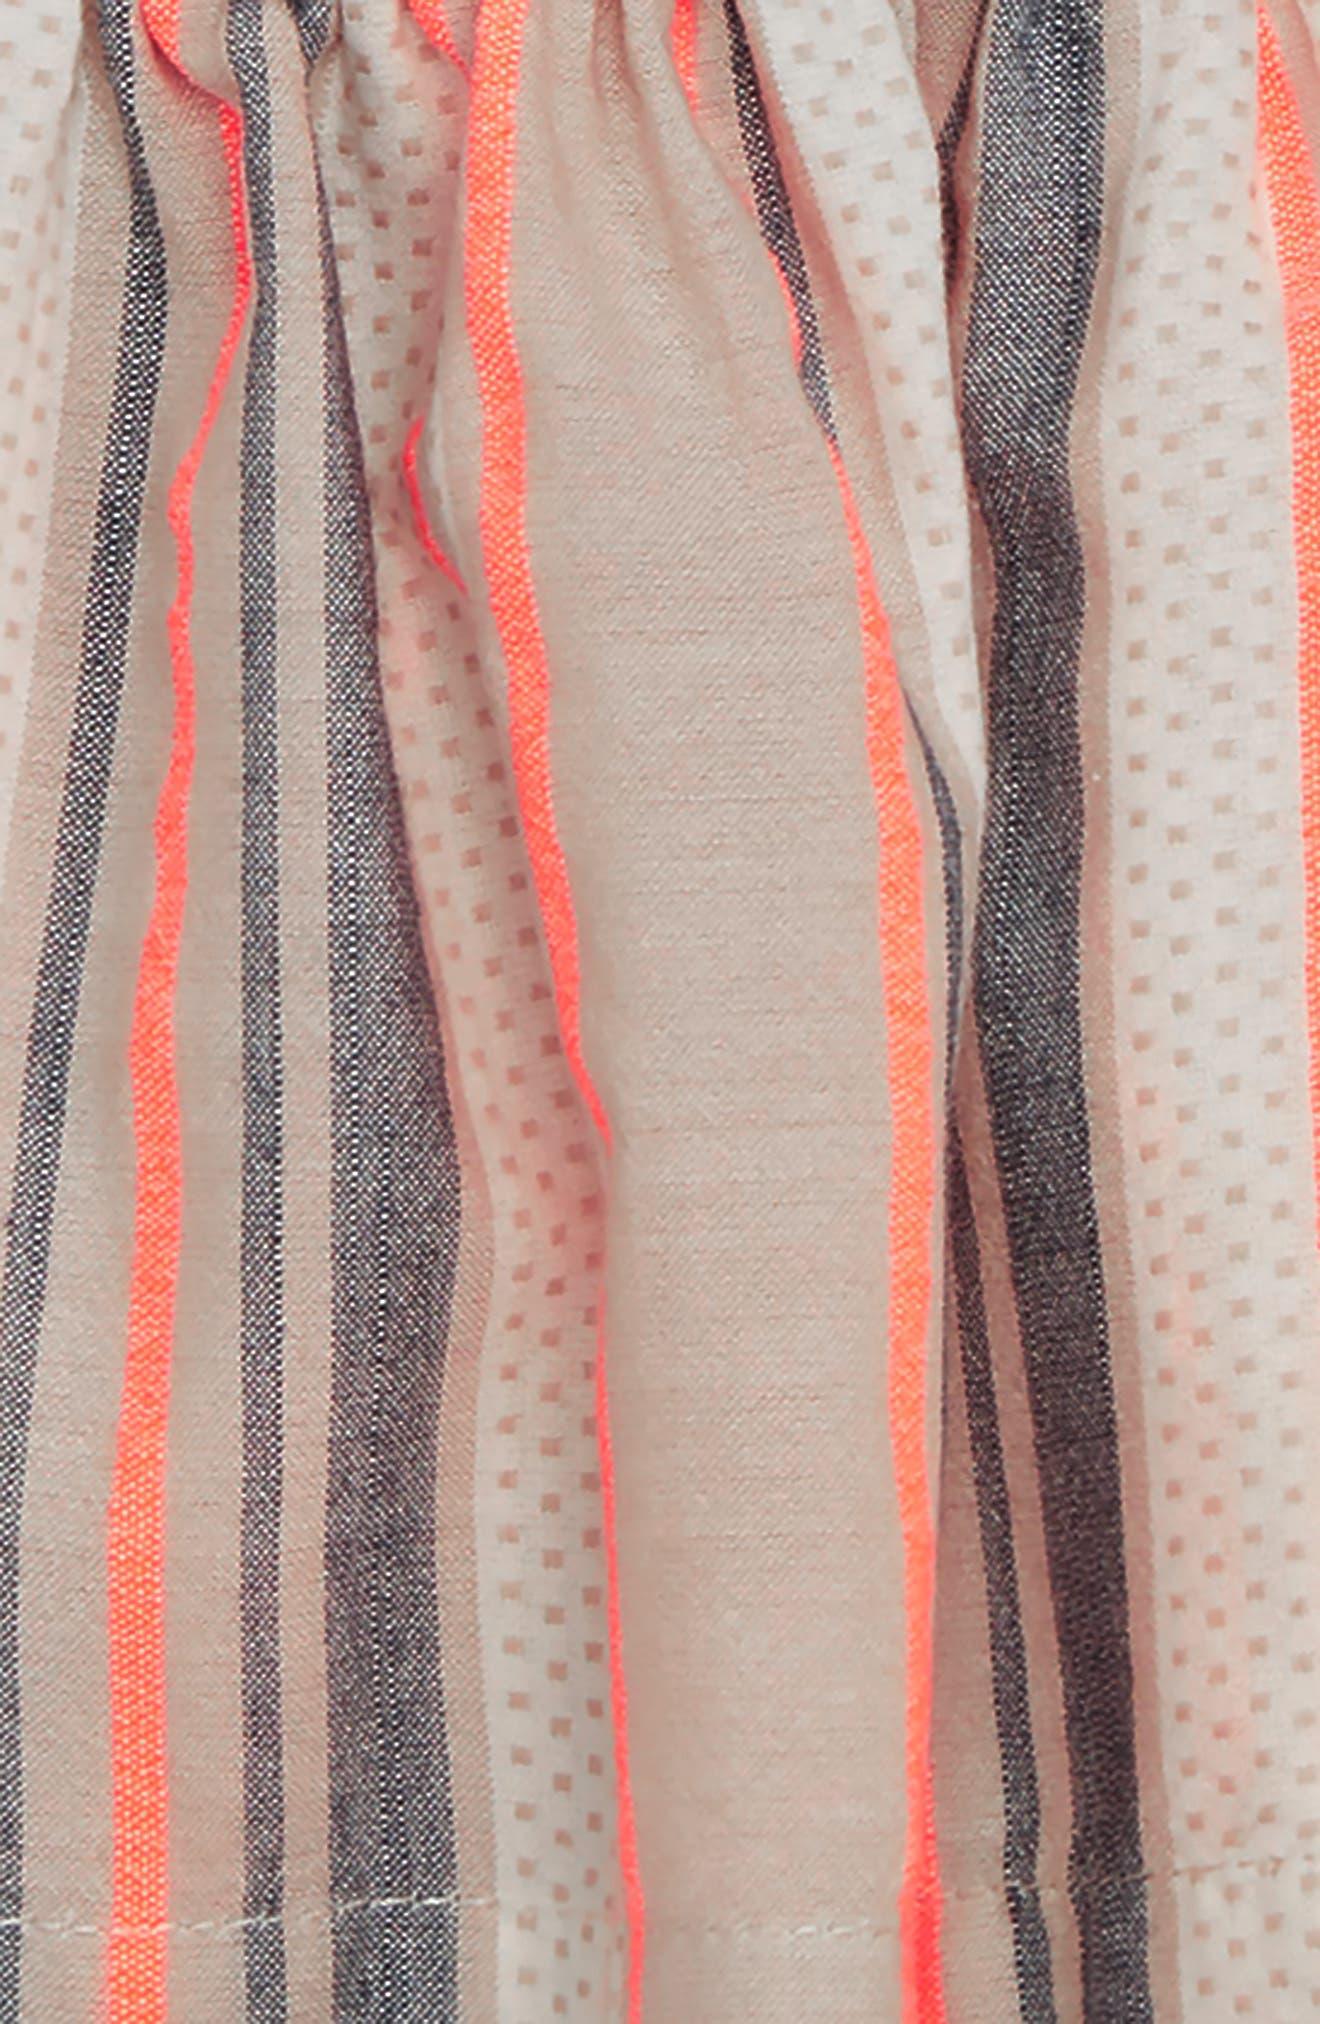 Woven Stripe Swing Top & Bubble Shorts Set,                             Alternate thumbnail 2, color,                             680